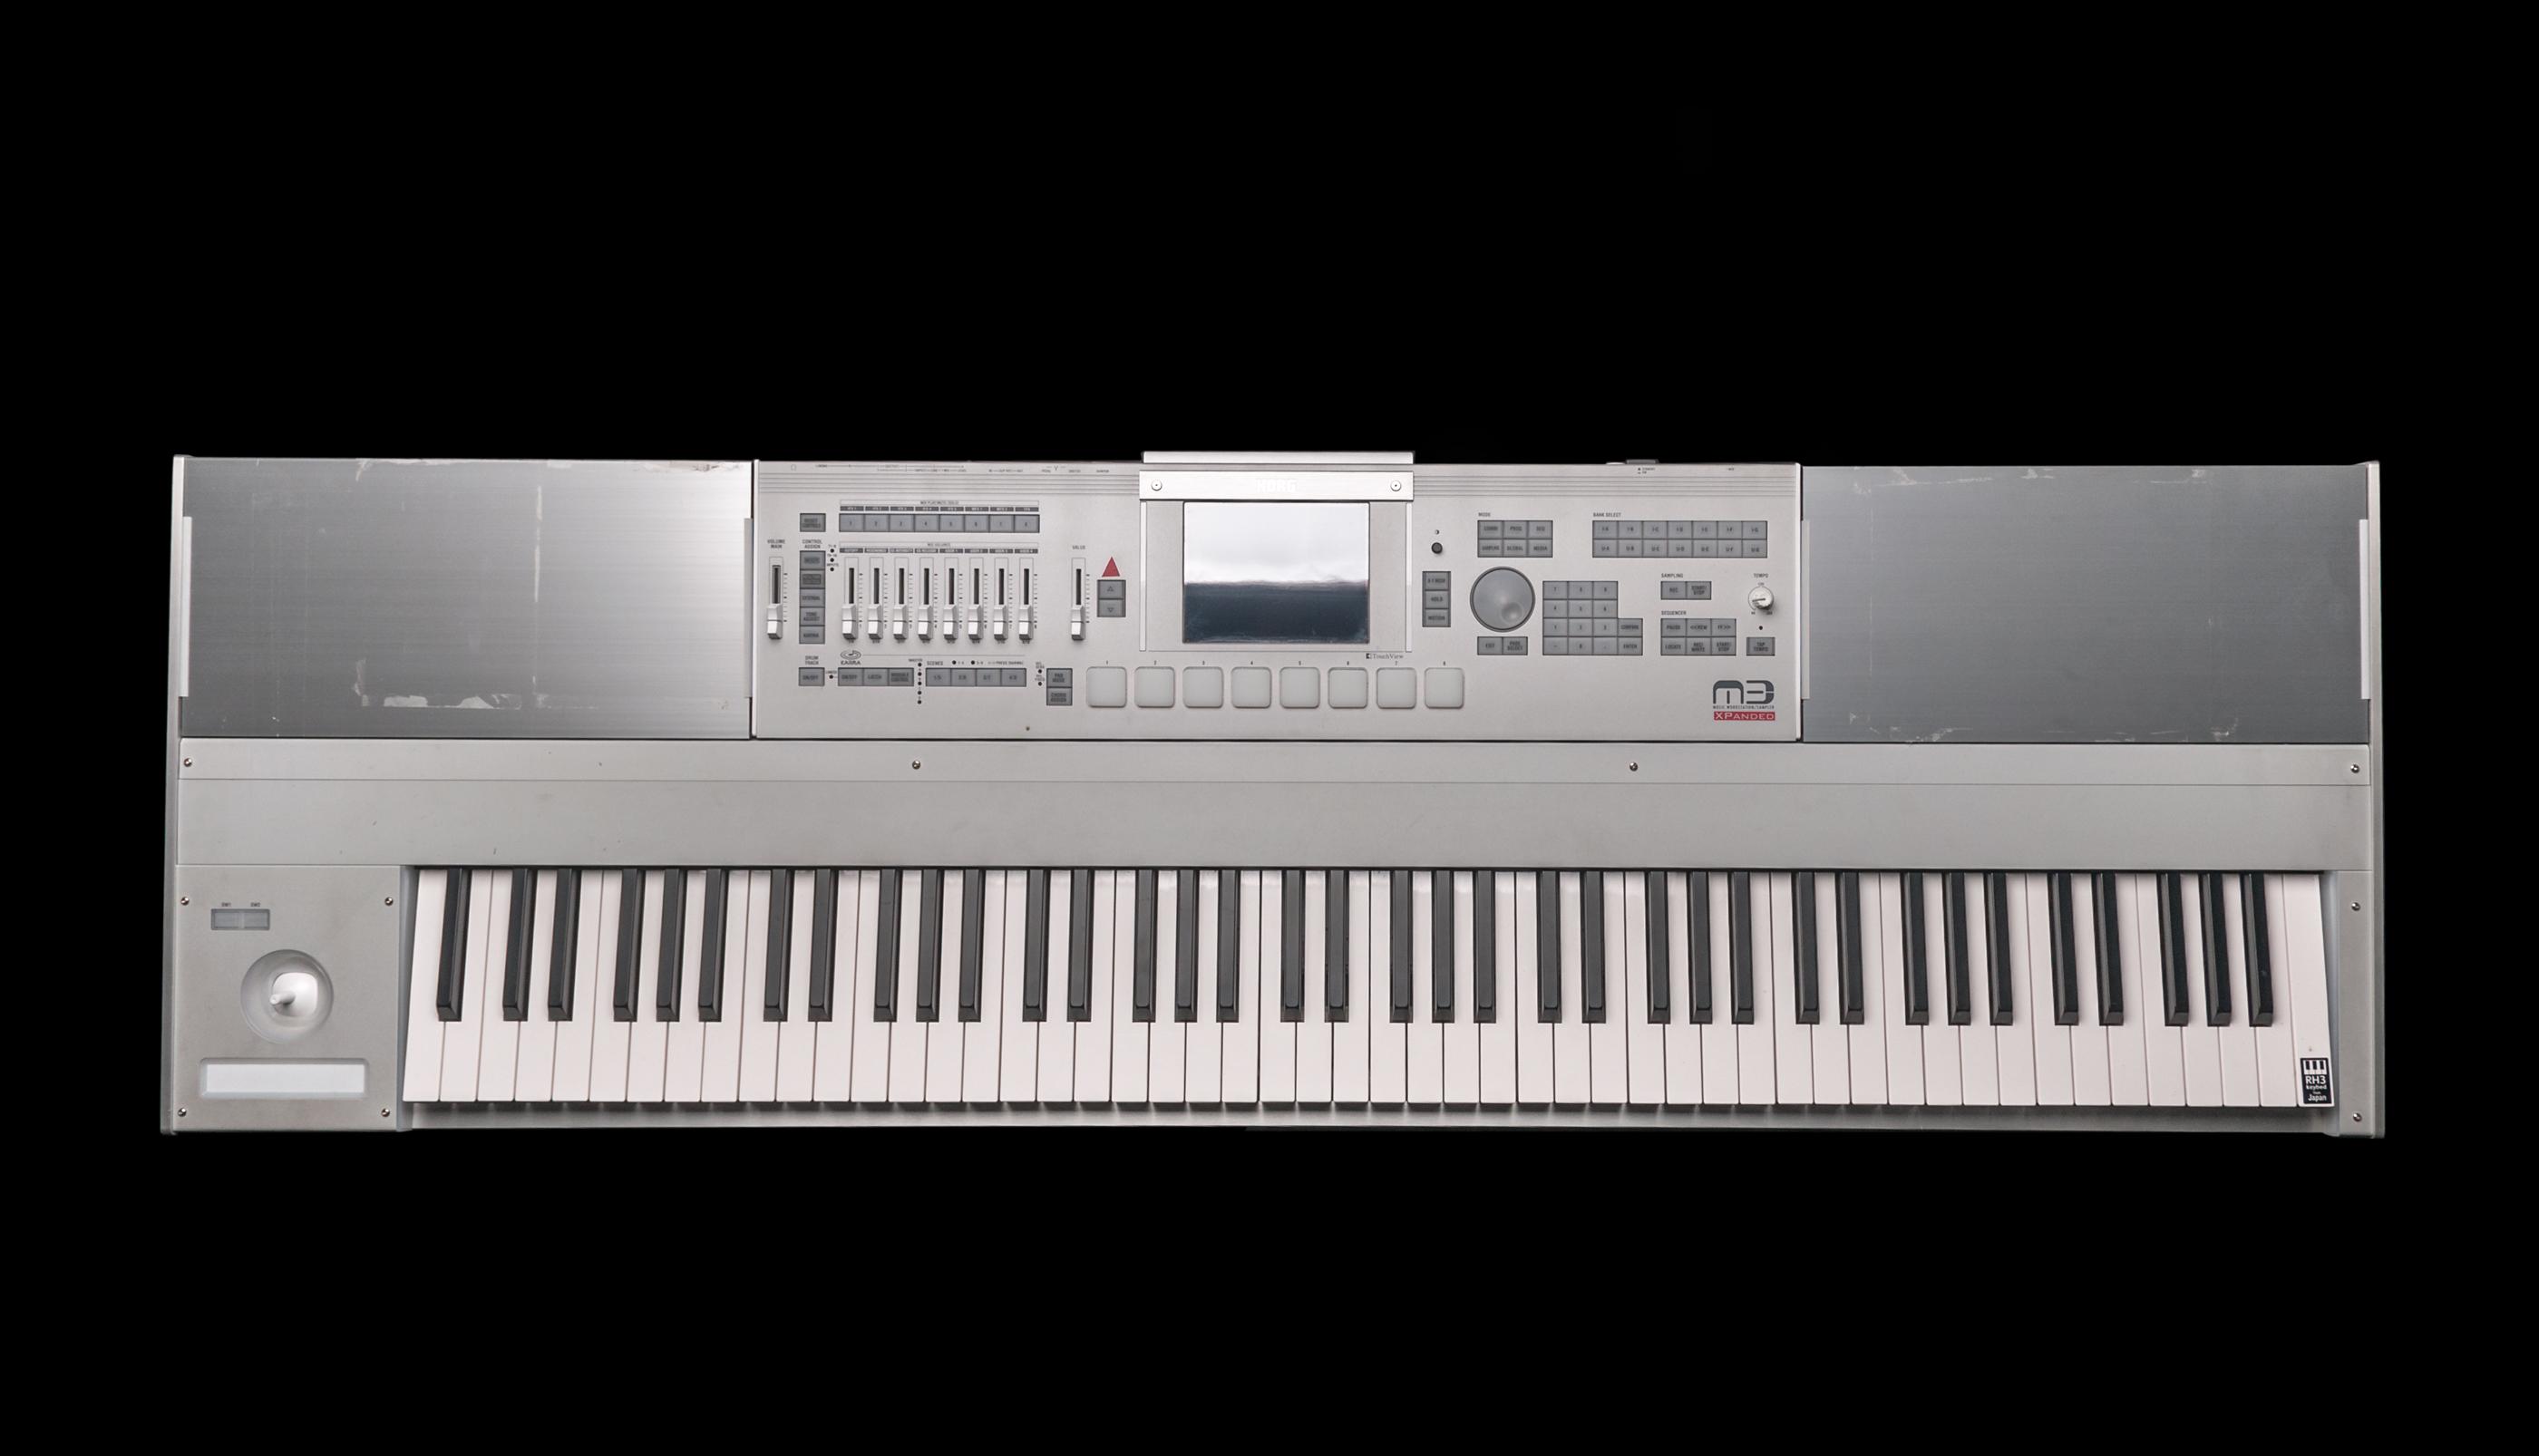 Workstation Keyboard Meaning : used korg m3 88 music workstation keyboard ebay ~ Russianpoet.info Haus und Dekorationen